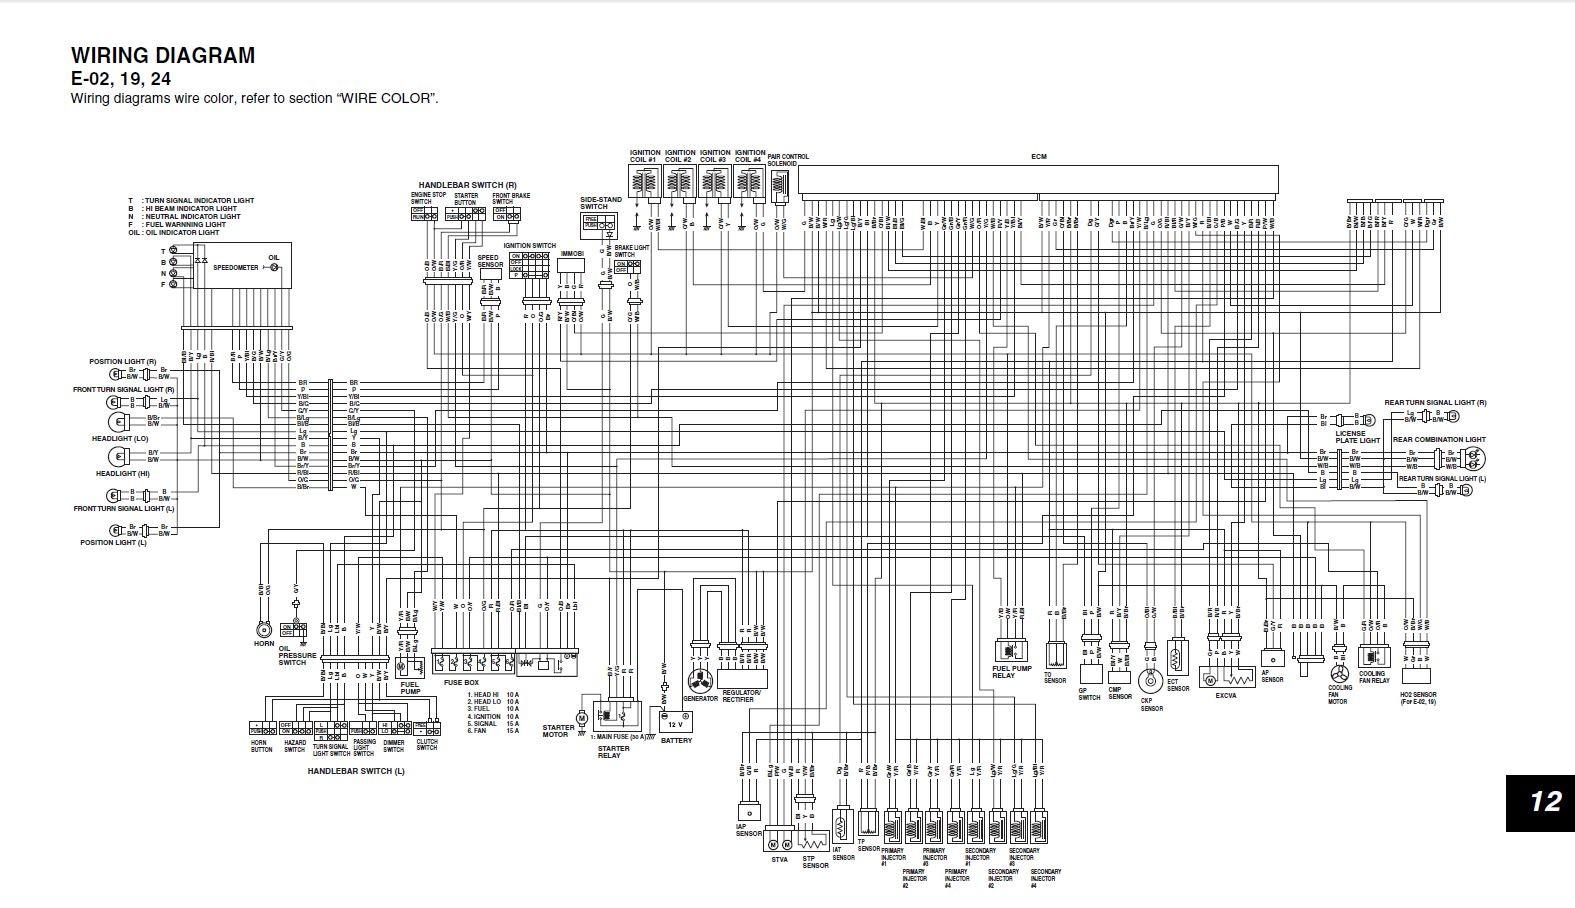 hight resolution of 2006 hayabusa wiring diagram wiring diagram centre2006 hayabusa wiring diagram wiring diagram2006 hayabusa wiring diagram 11